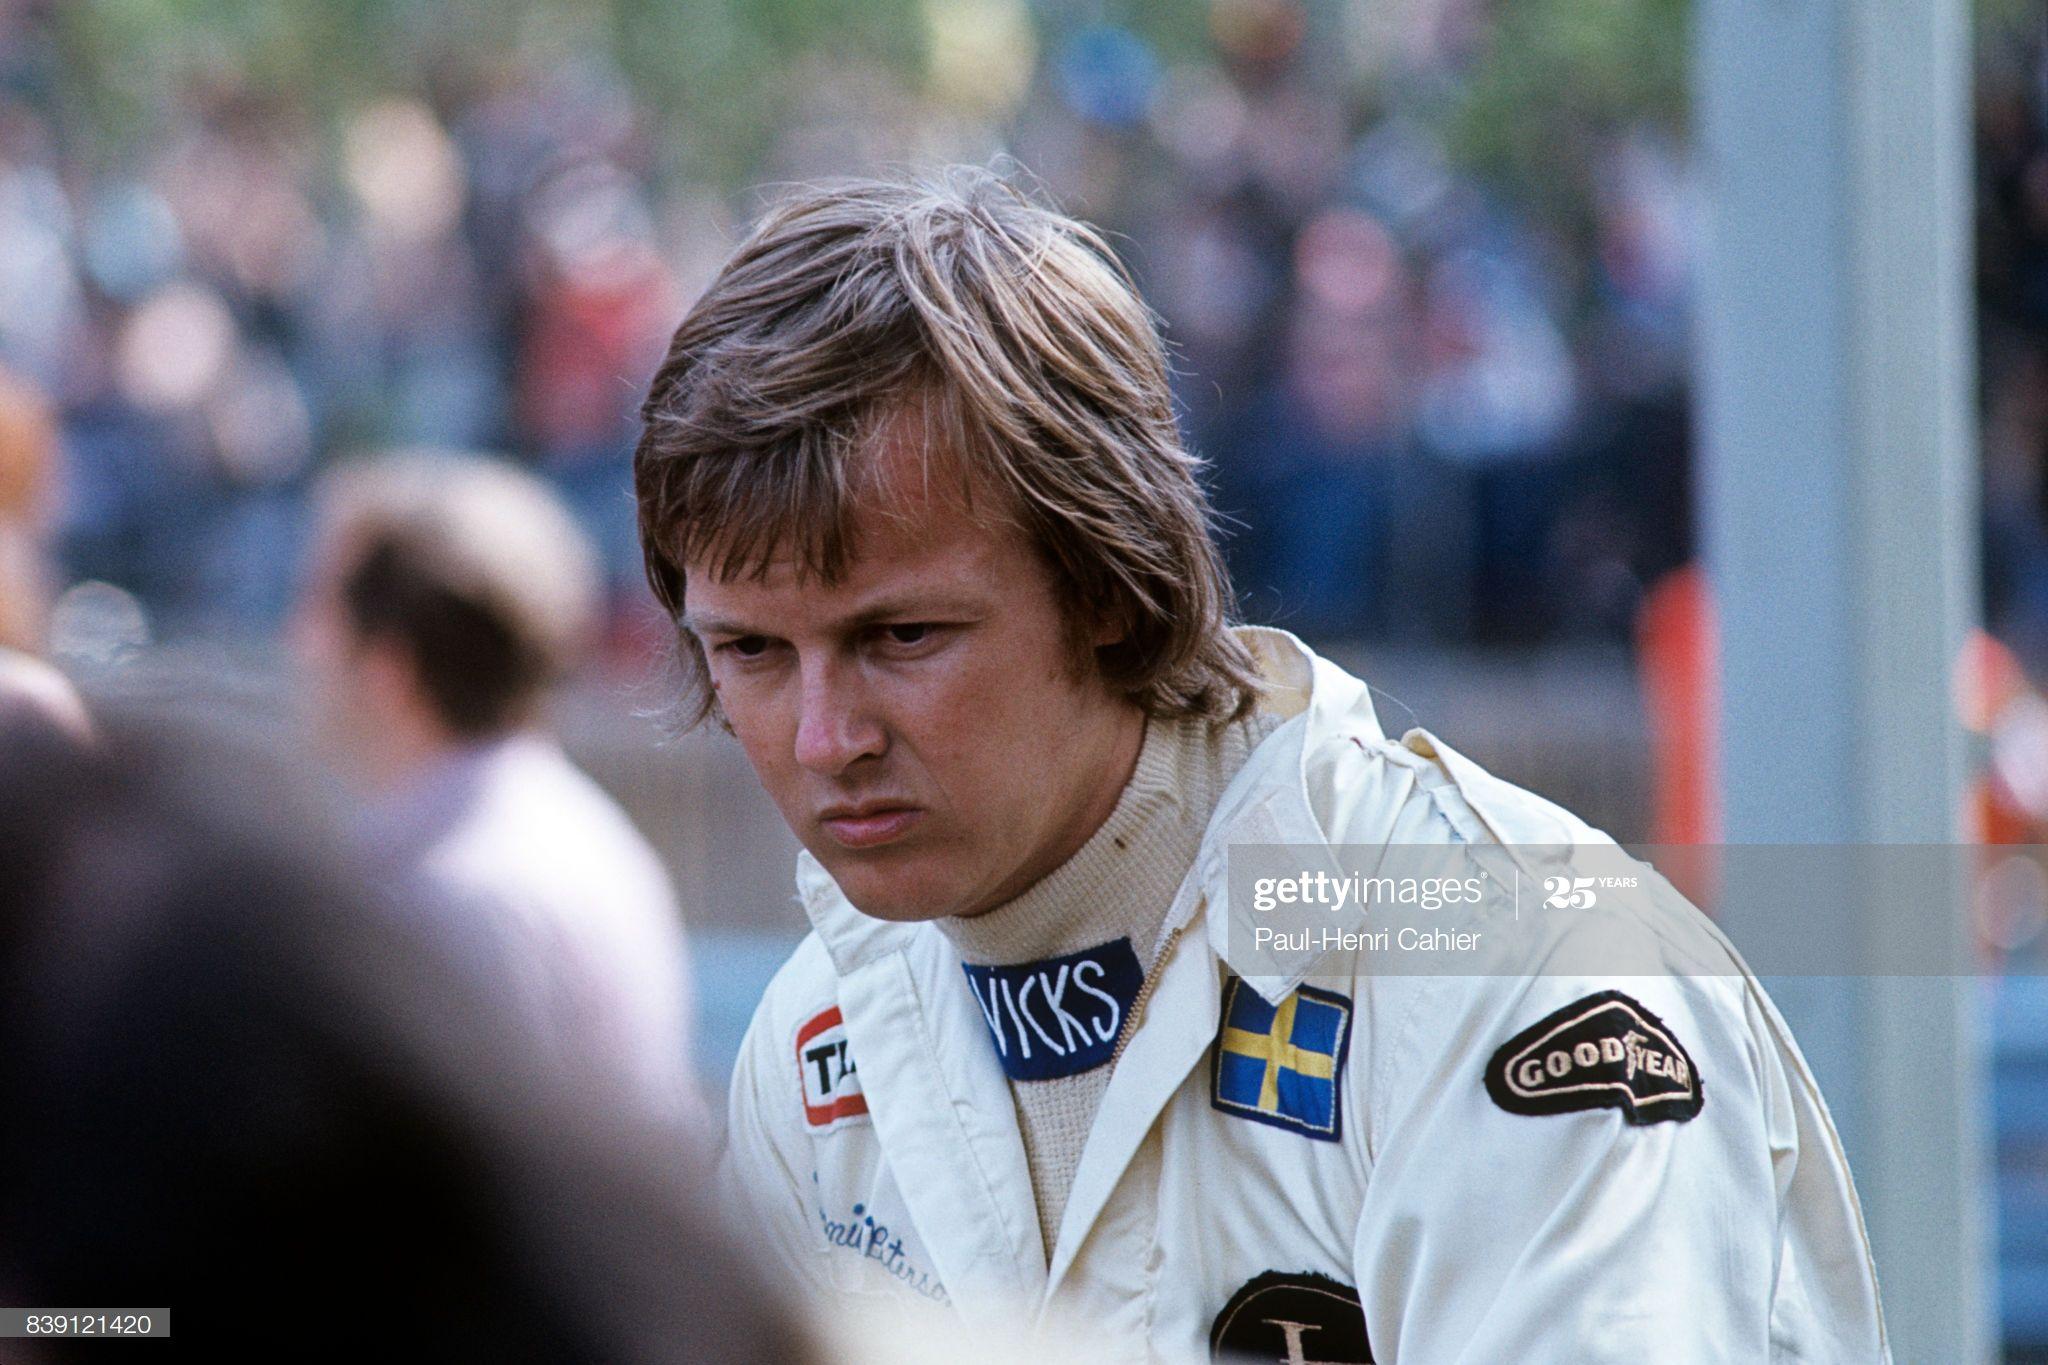 Ronnie Peterson, F1, Almby